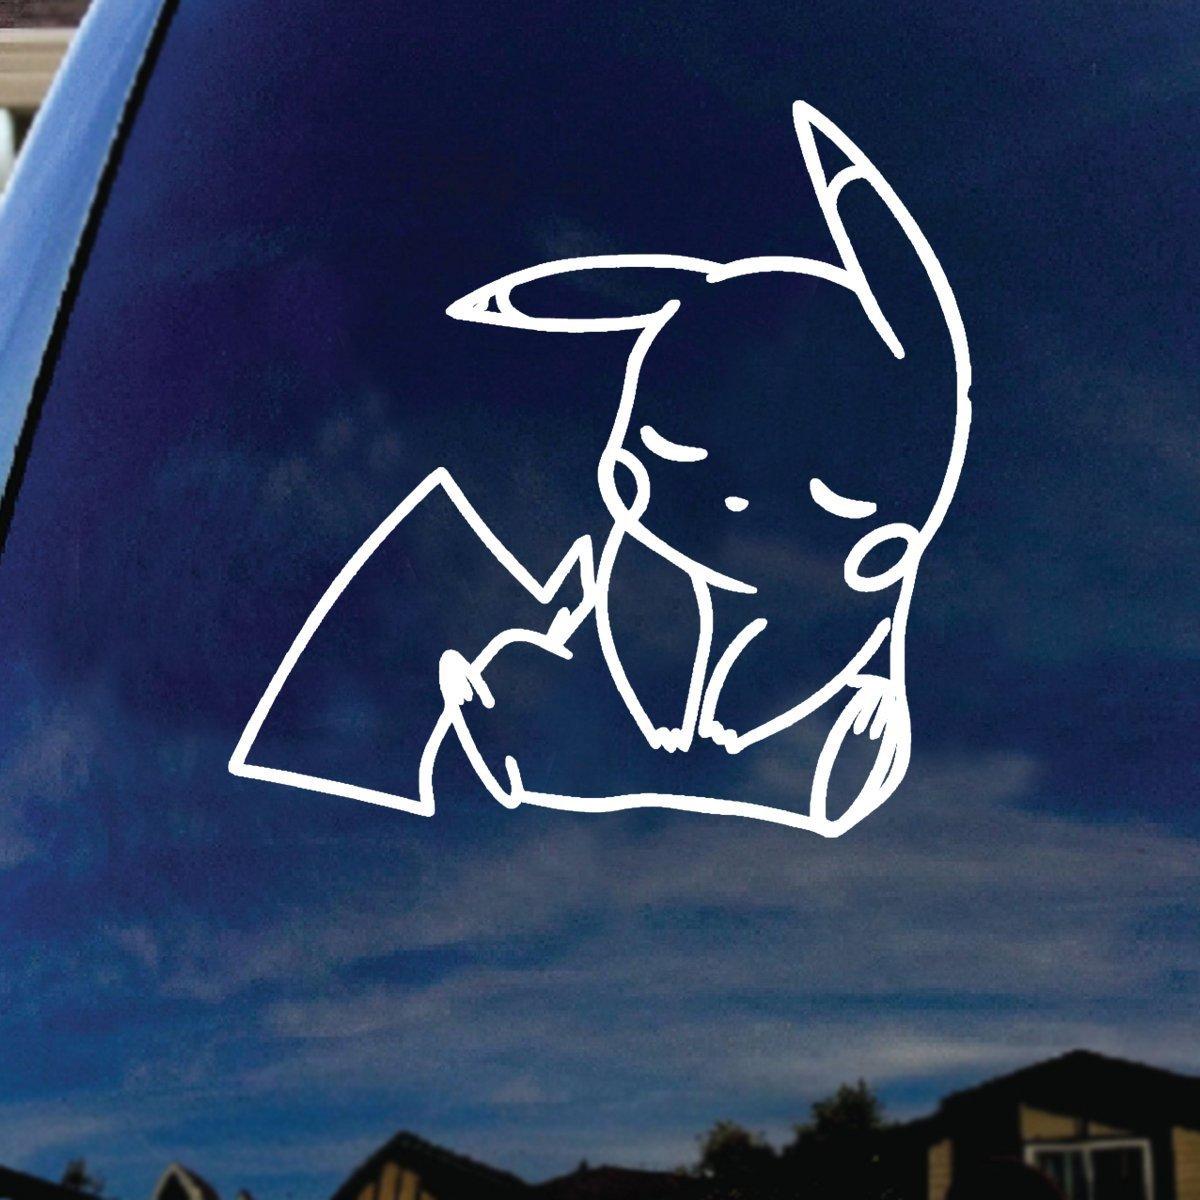 Maple Enterprise Pikachu Cartoon Character Sleeping Car Window Vinyl Decal Sticker 5 Tall